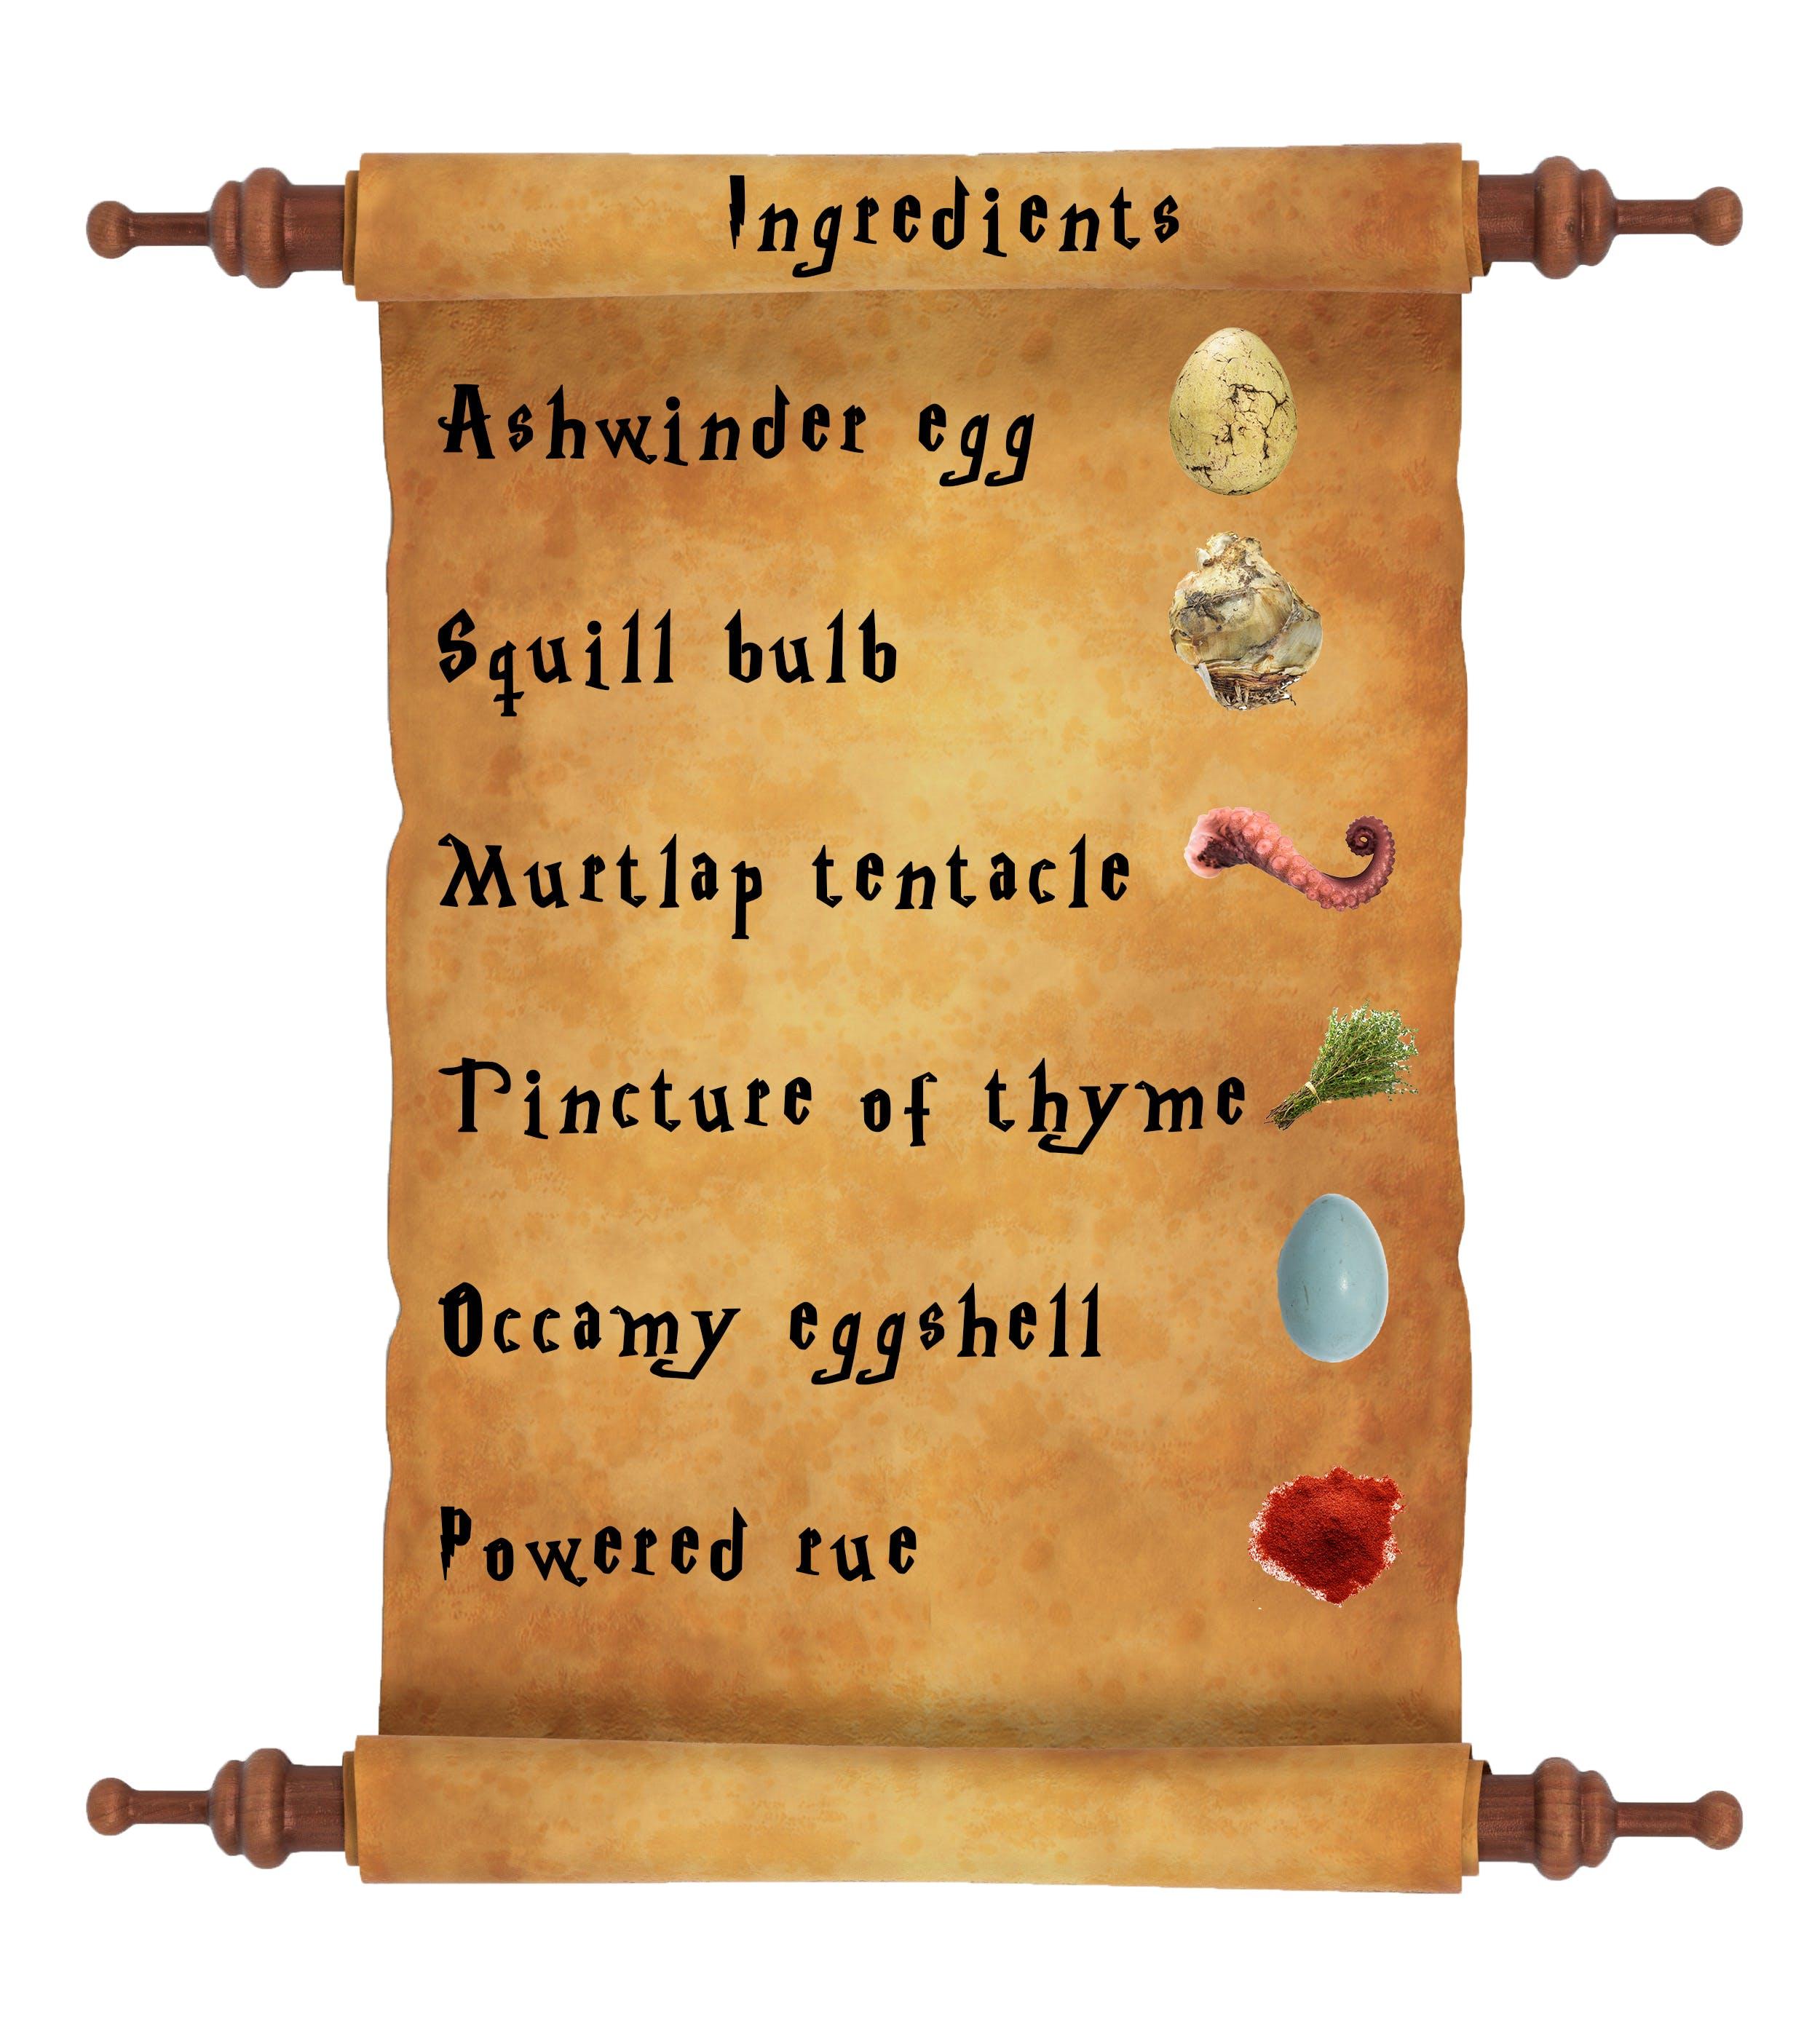 Harry Potter potion list - Felix Felicis ingredients